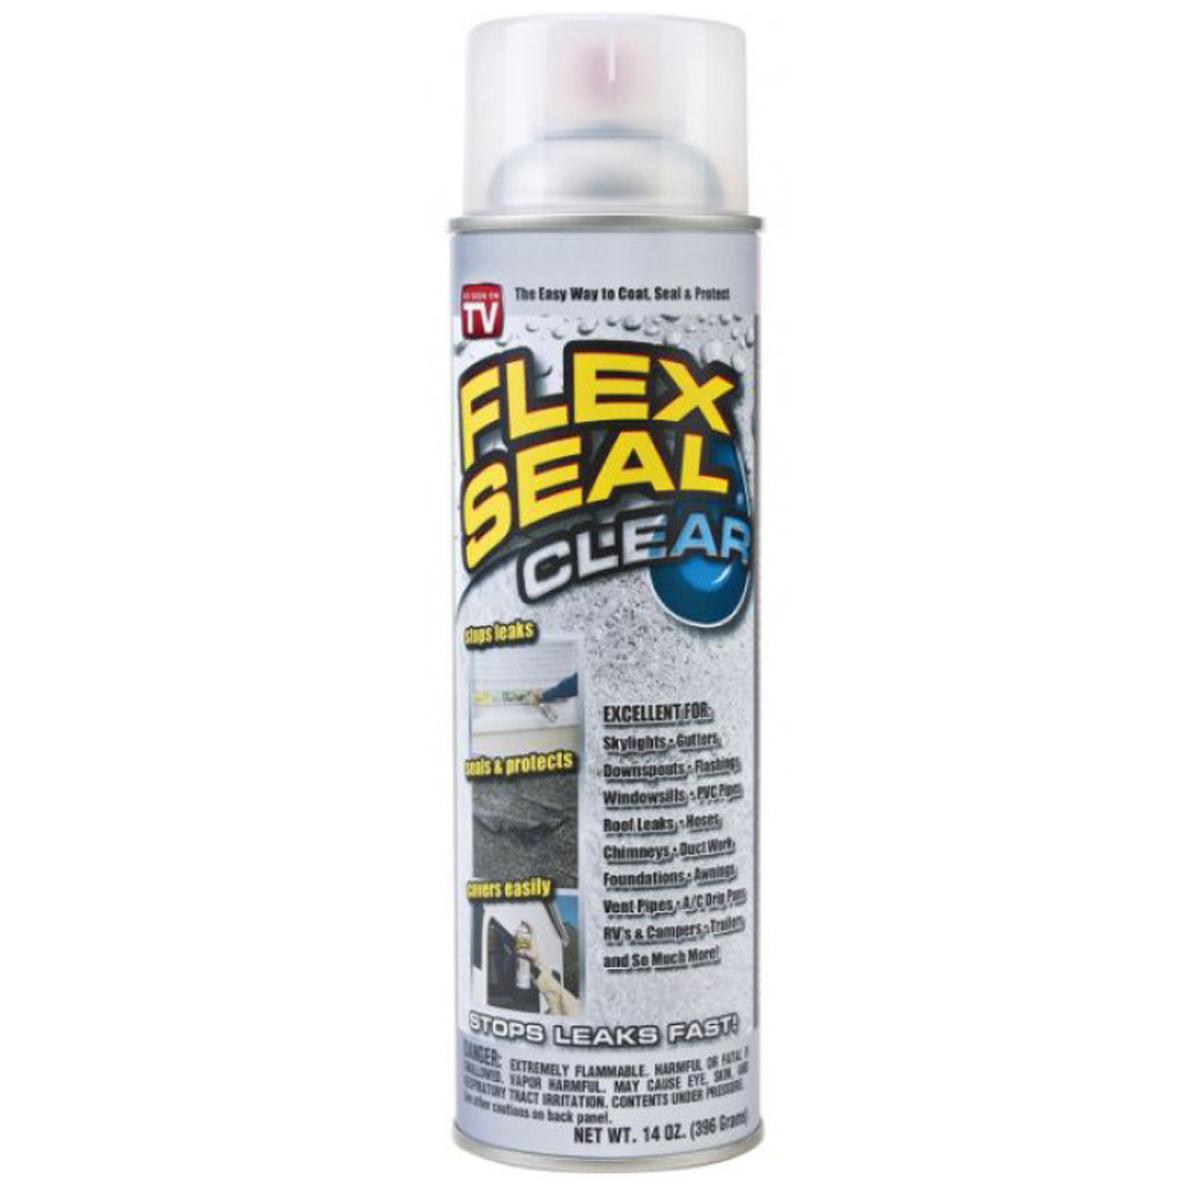 Flex Seal Clear